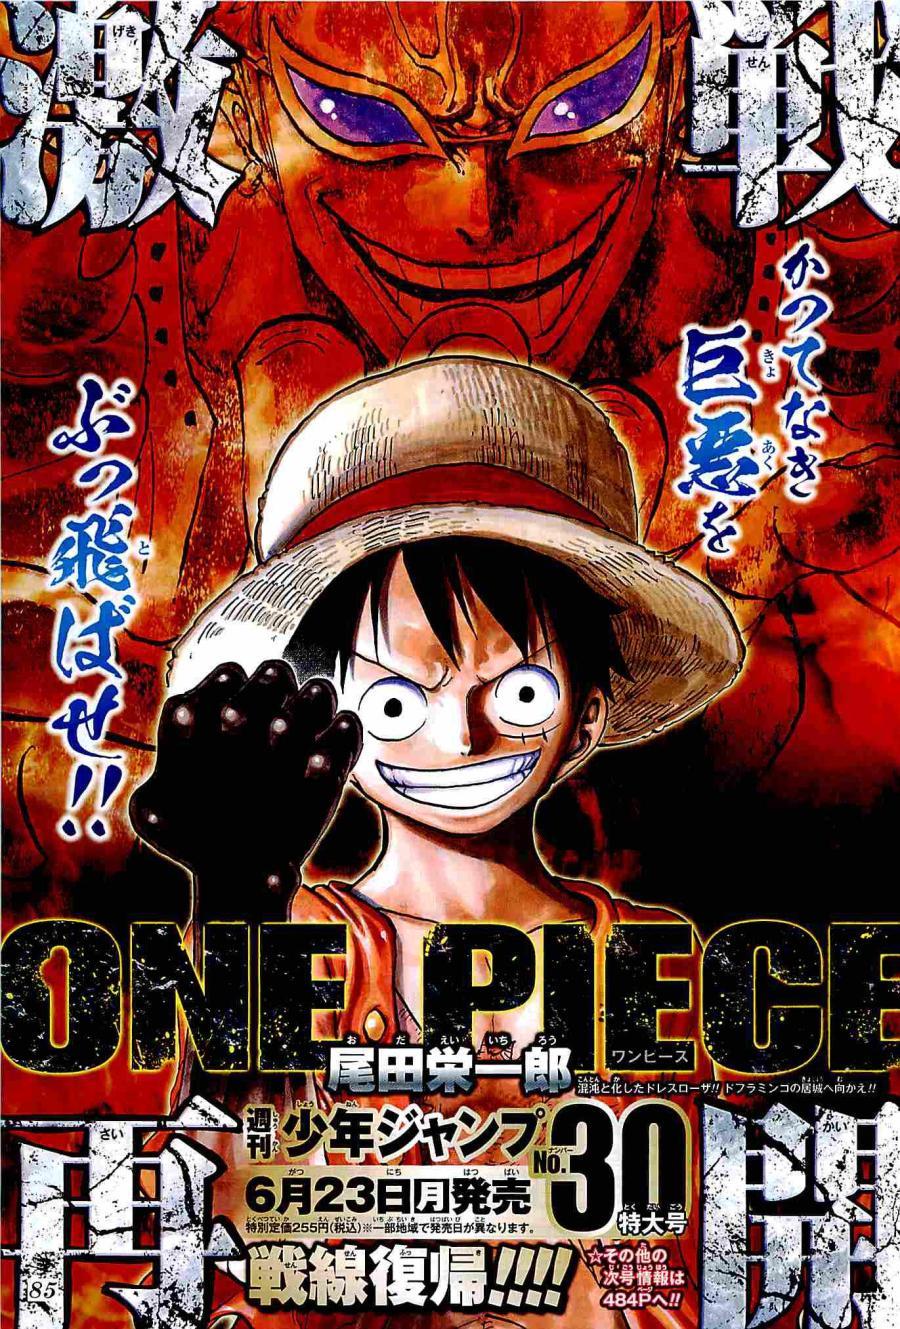 One Piece bientôt dans Weekly Shonen Jump 2014 #30